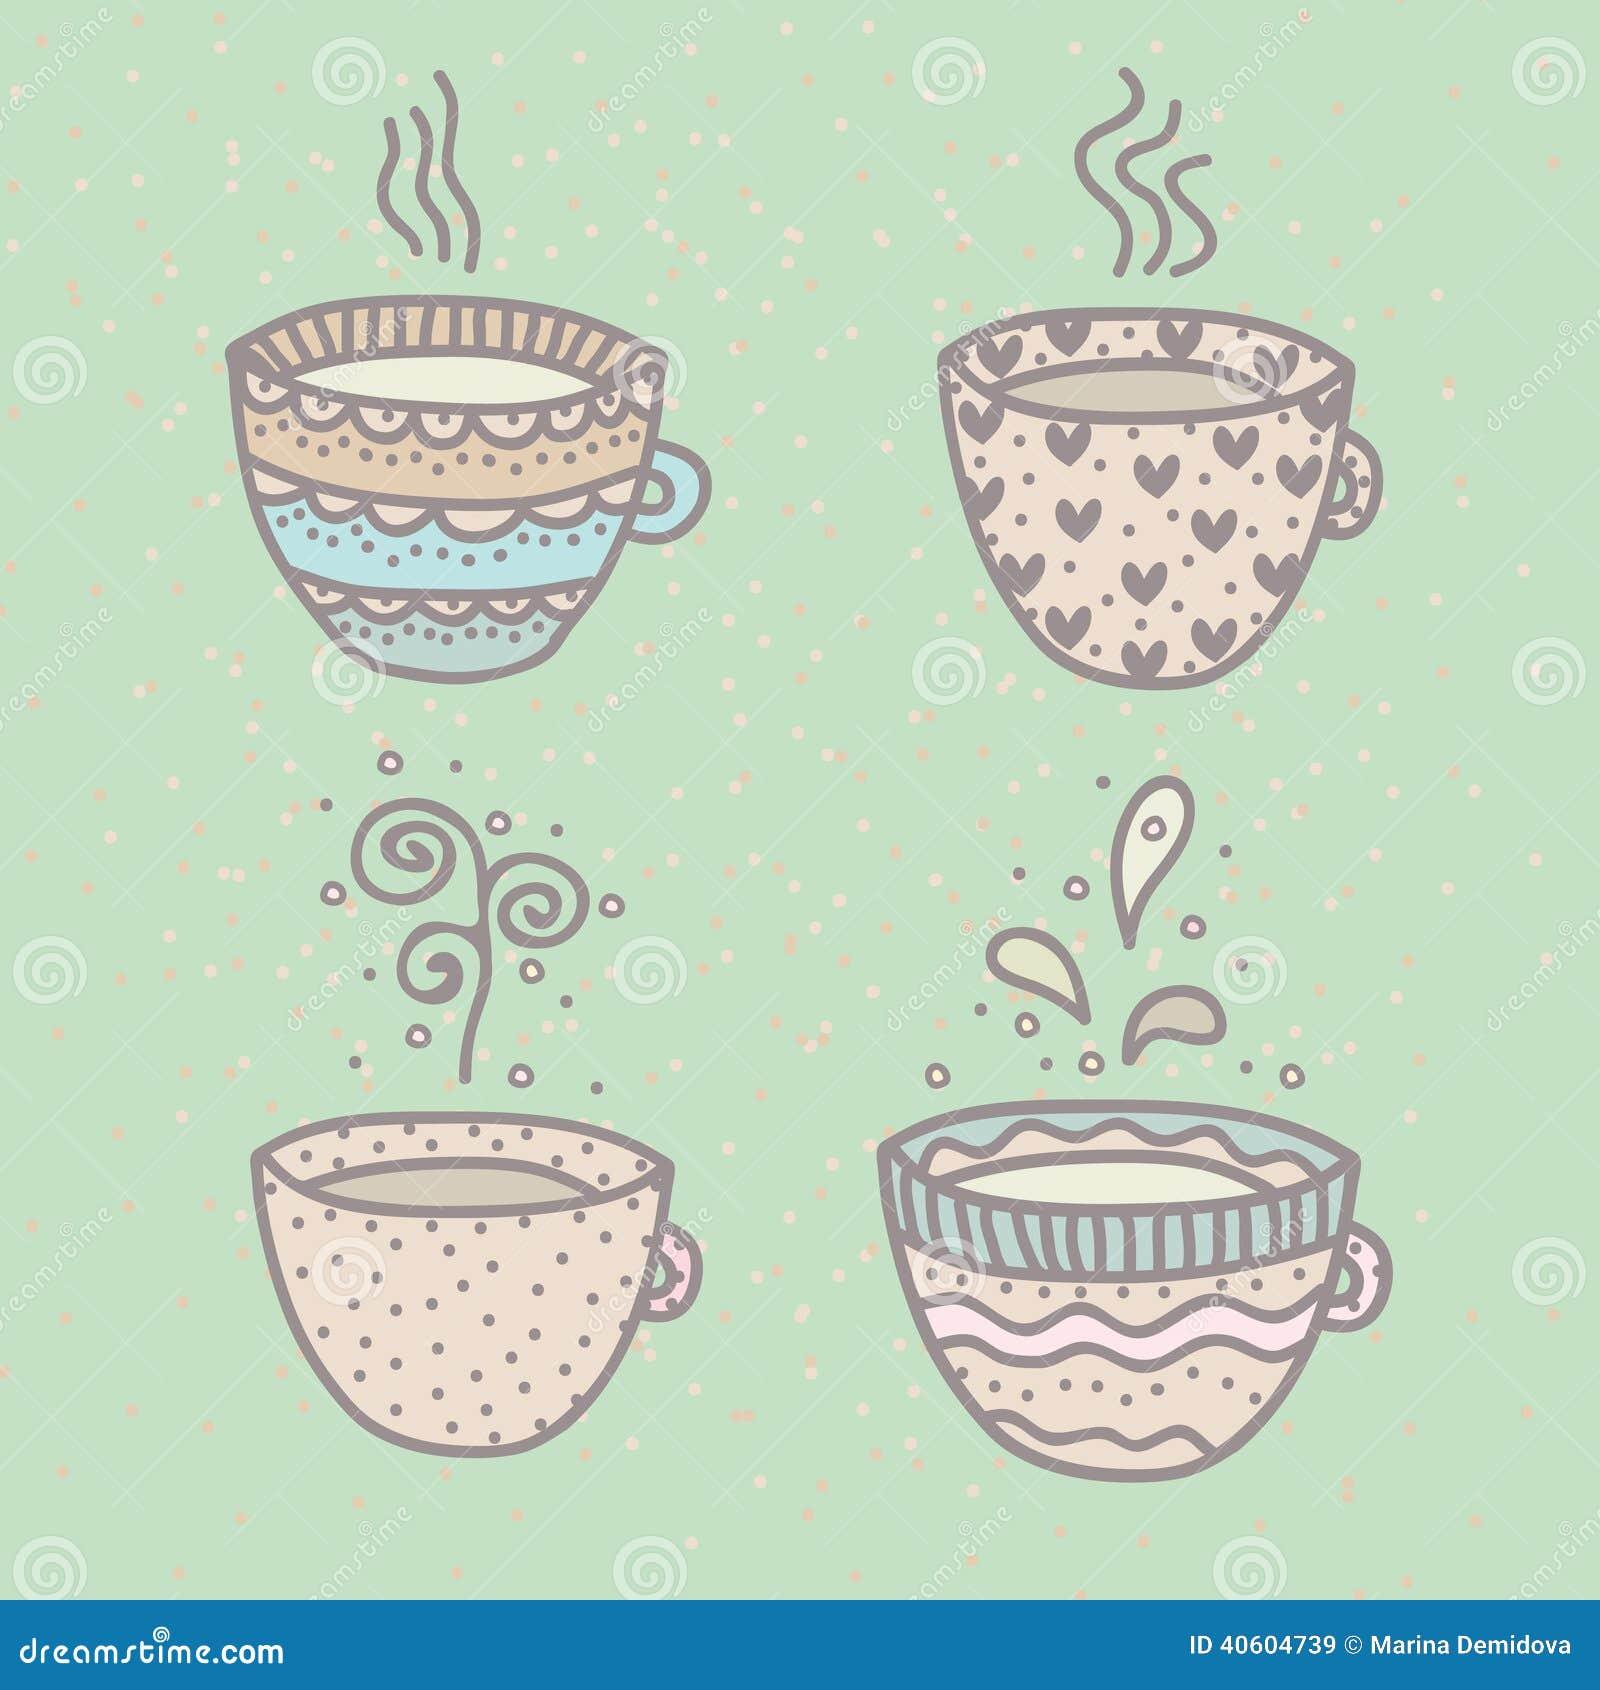 Set of cute cups